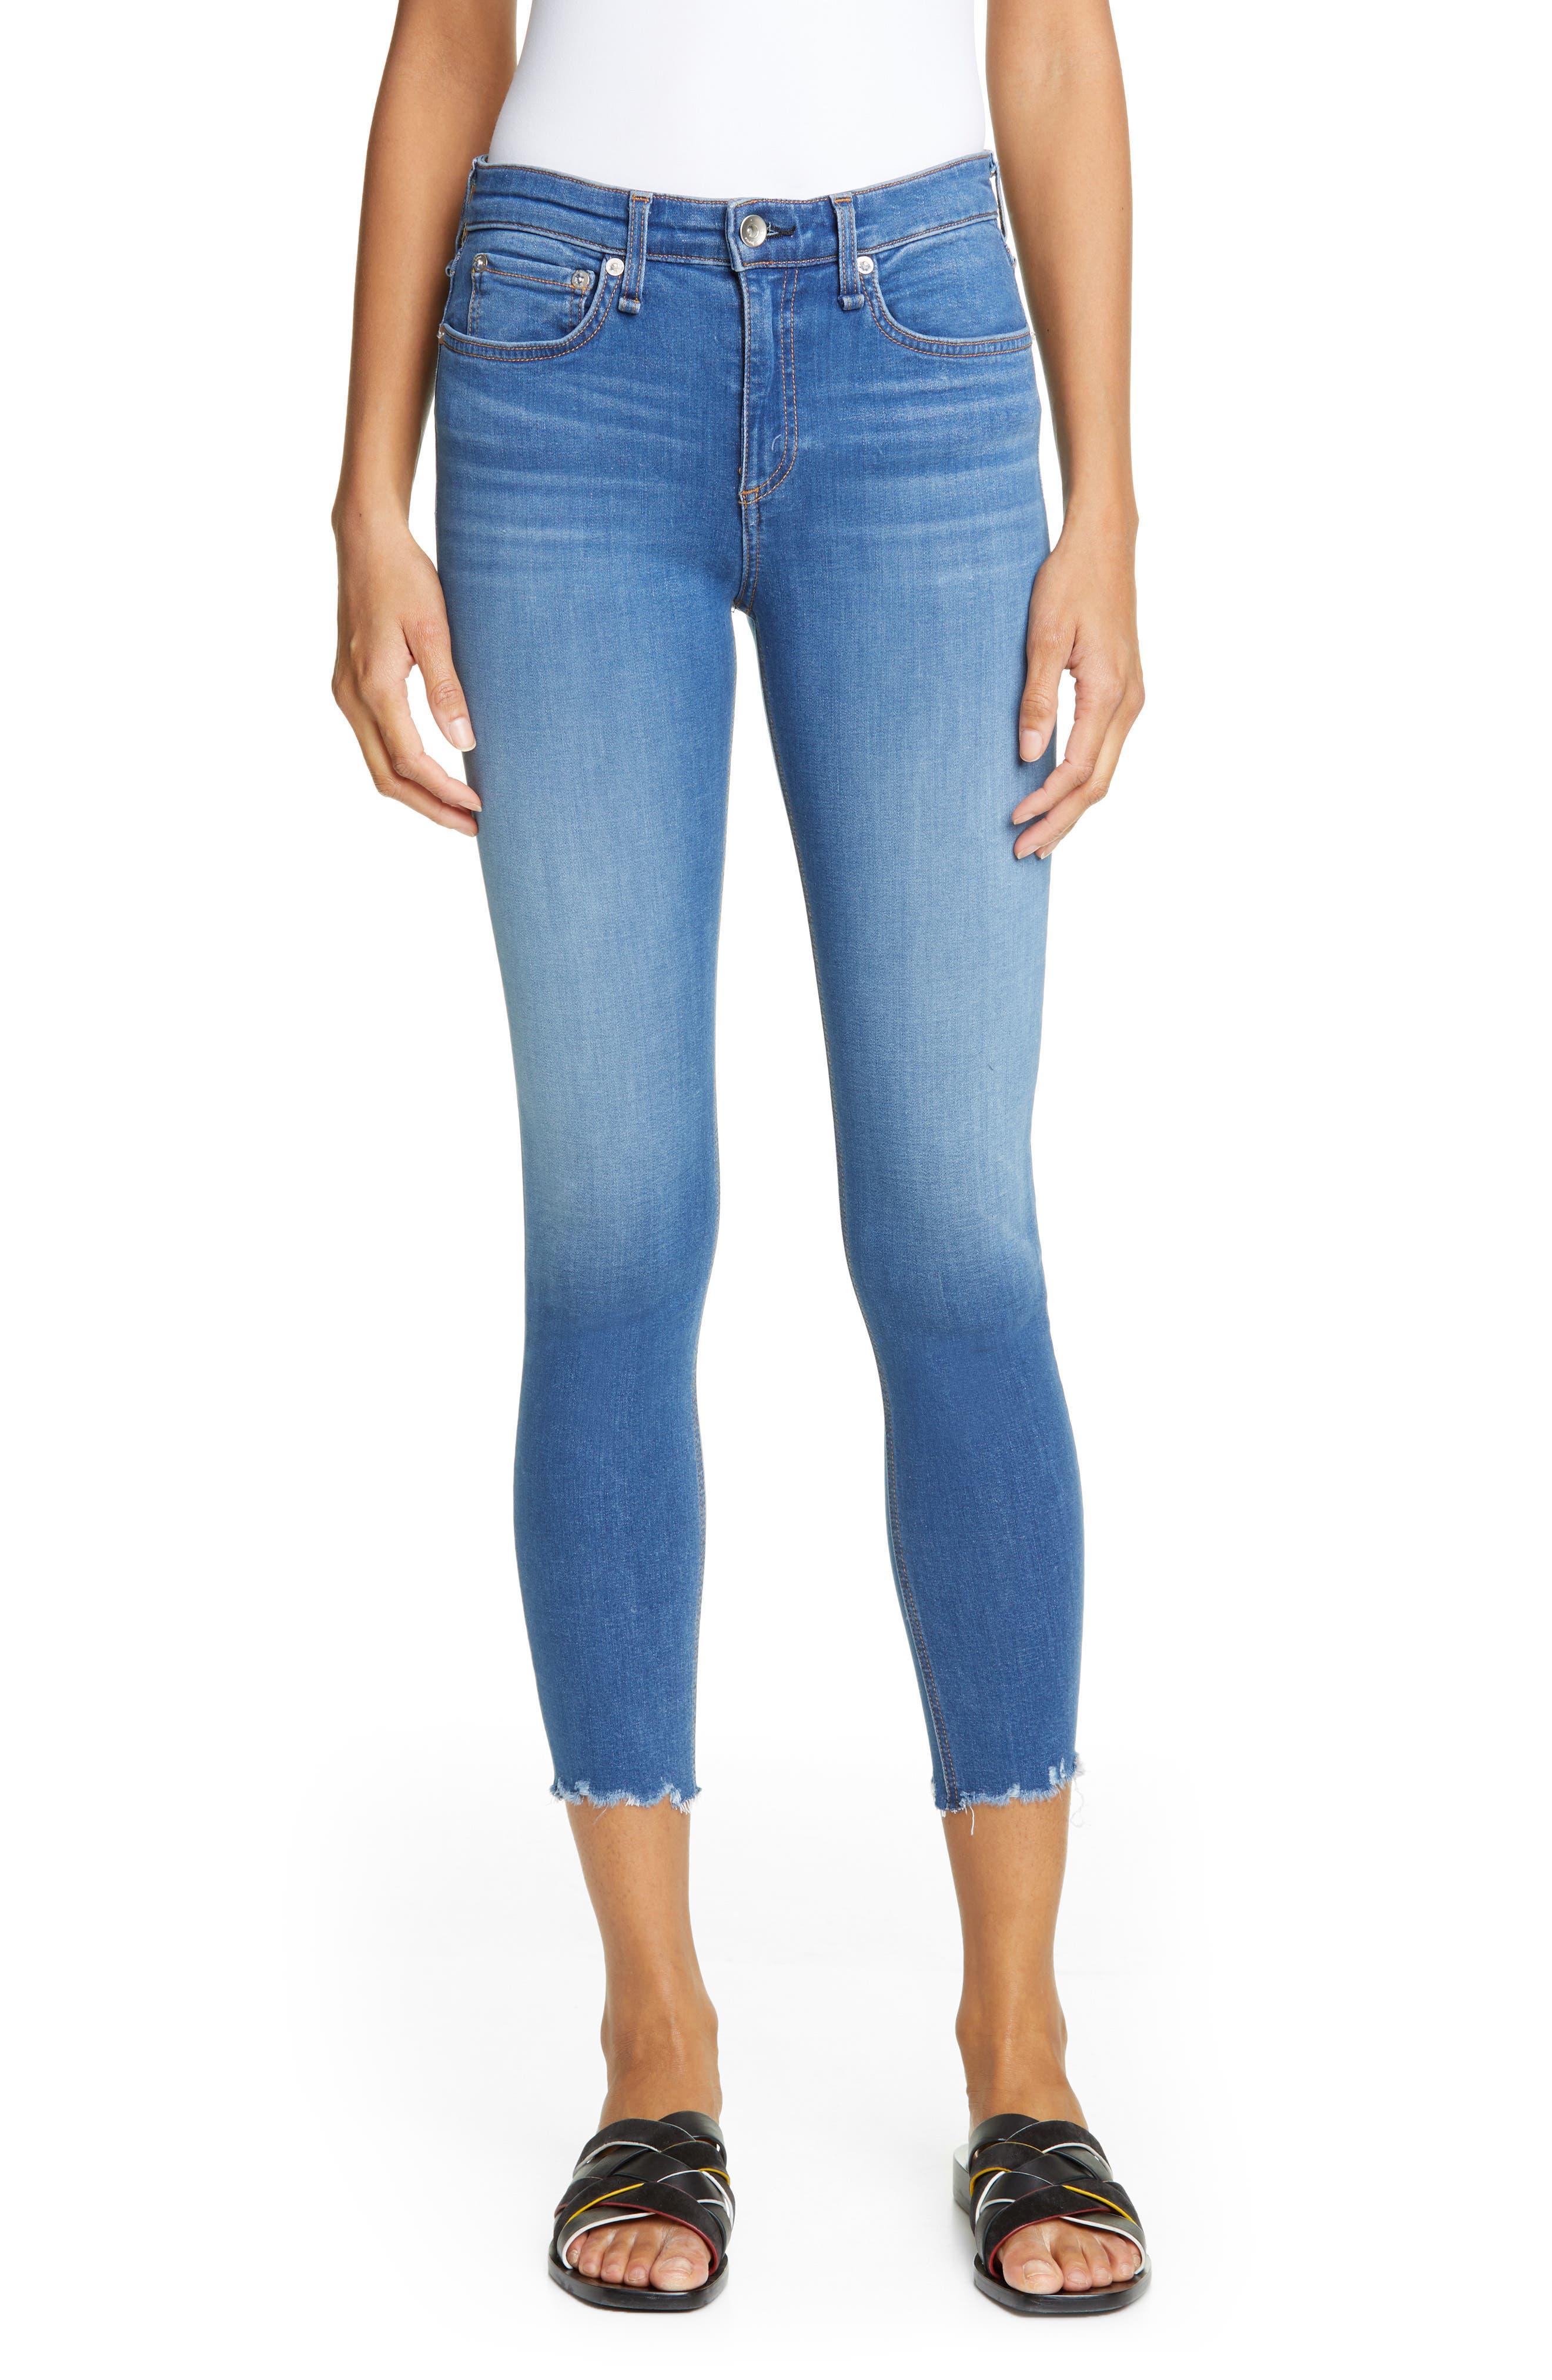 RAG & BONE Cate High Waist Ankle Skinny Jeans, Main, color, FLINT